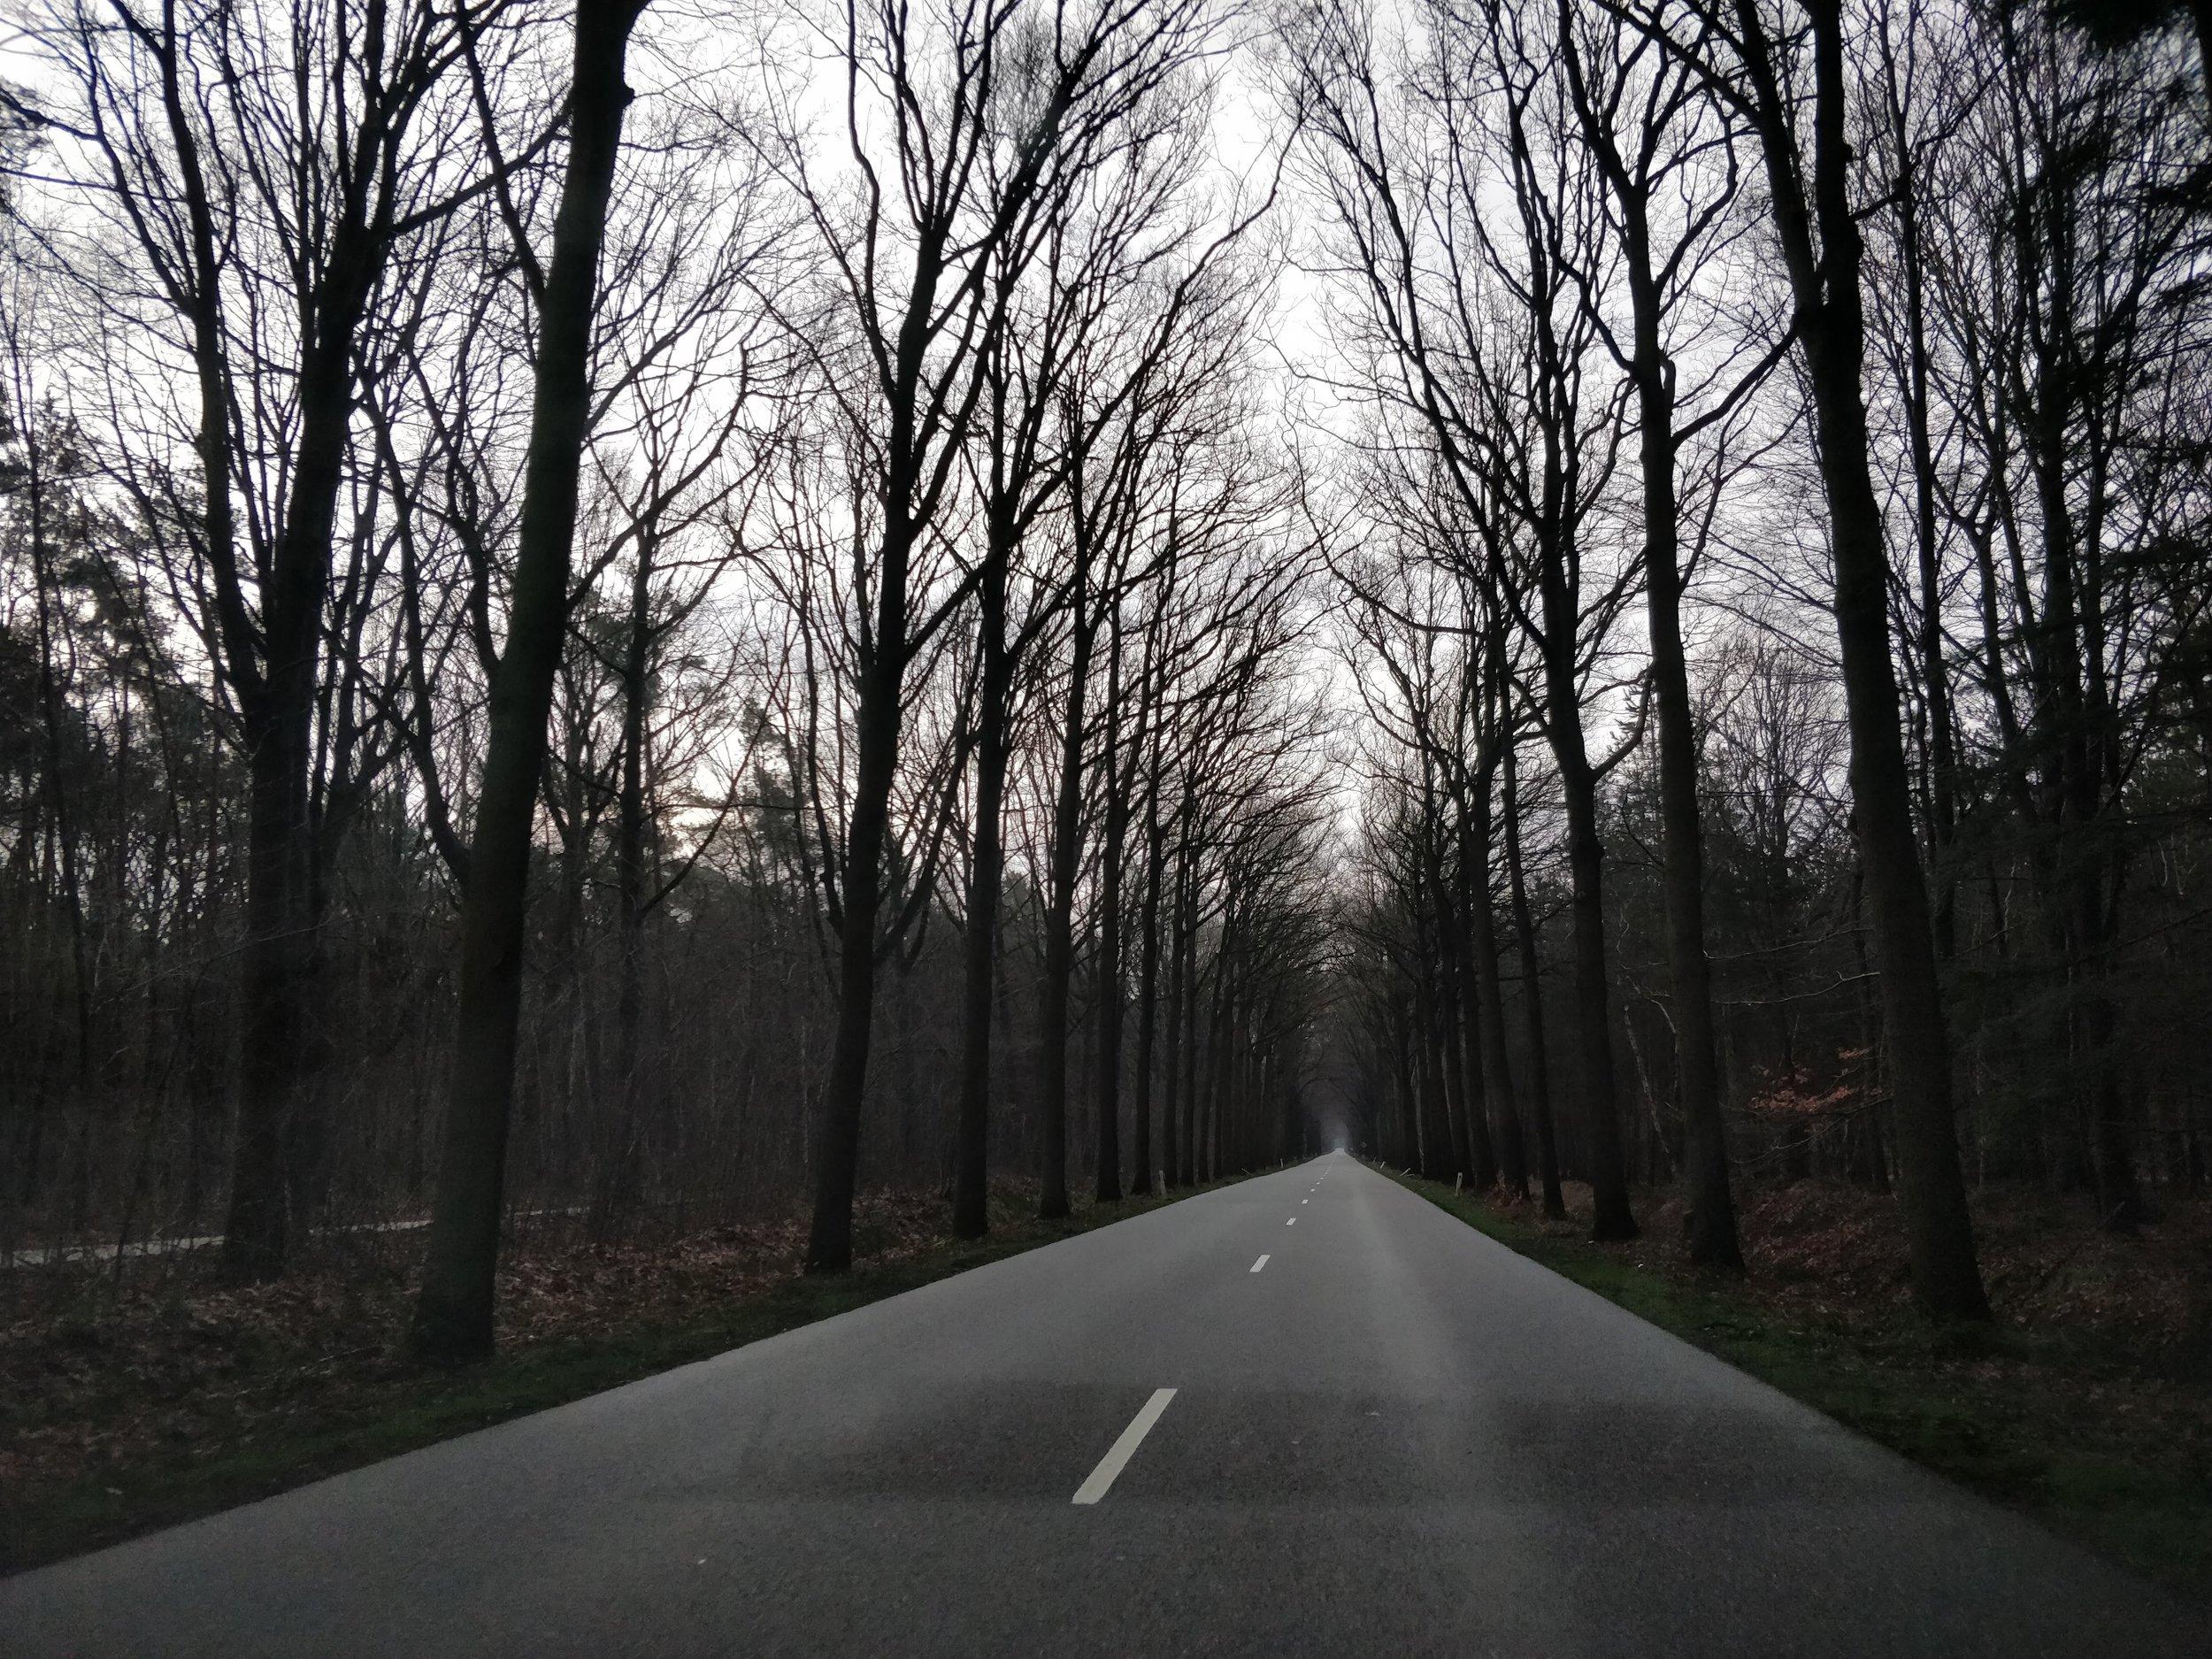 The road to Hoogerheide